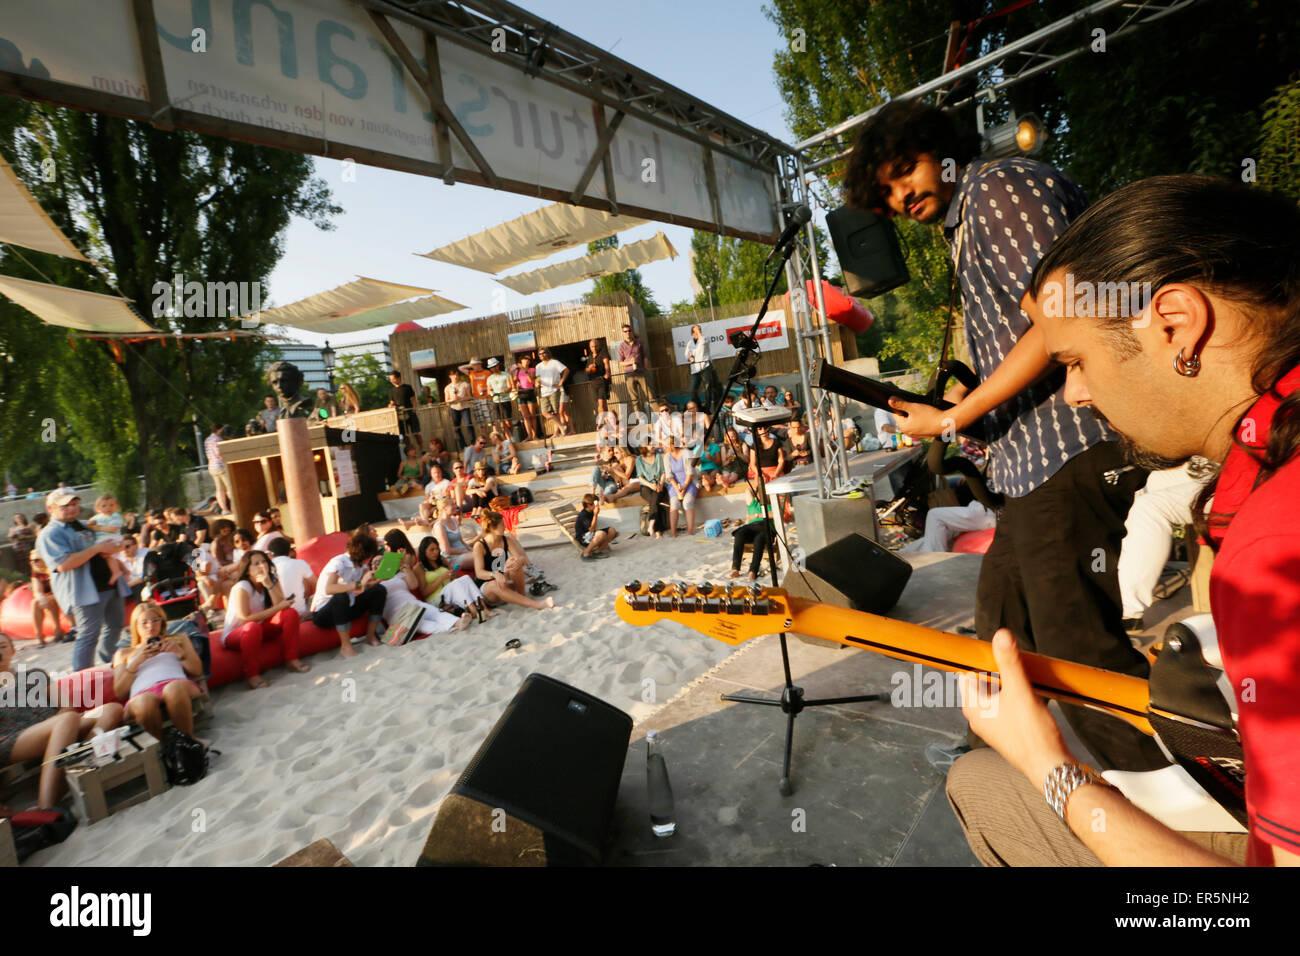 Live music, Kulturstrand at Corneliusbruecke, Munich, Bavaria, Germany - Stock Image